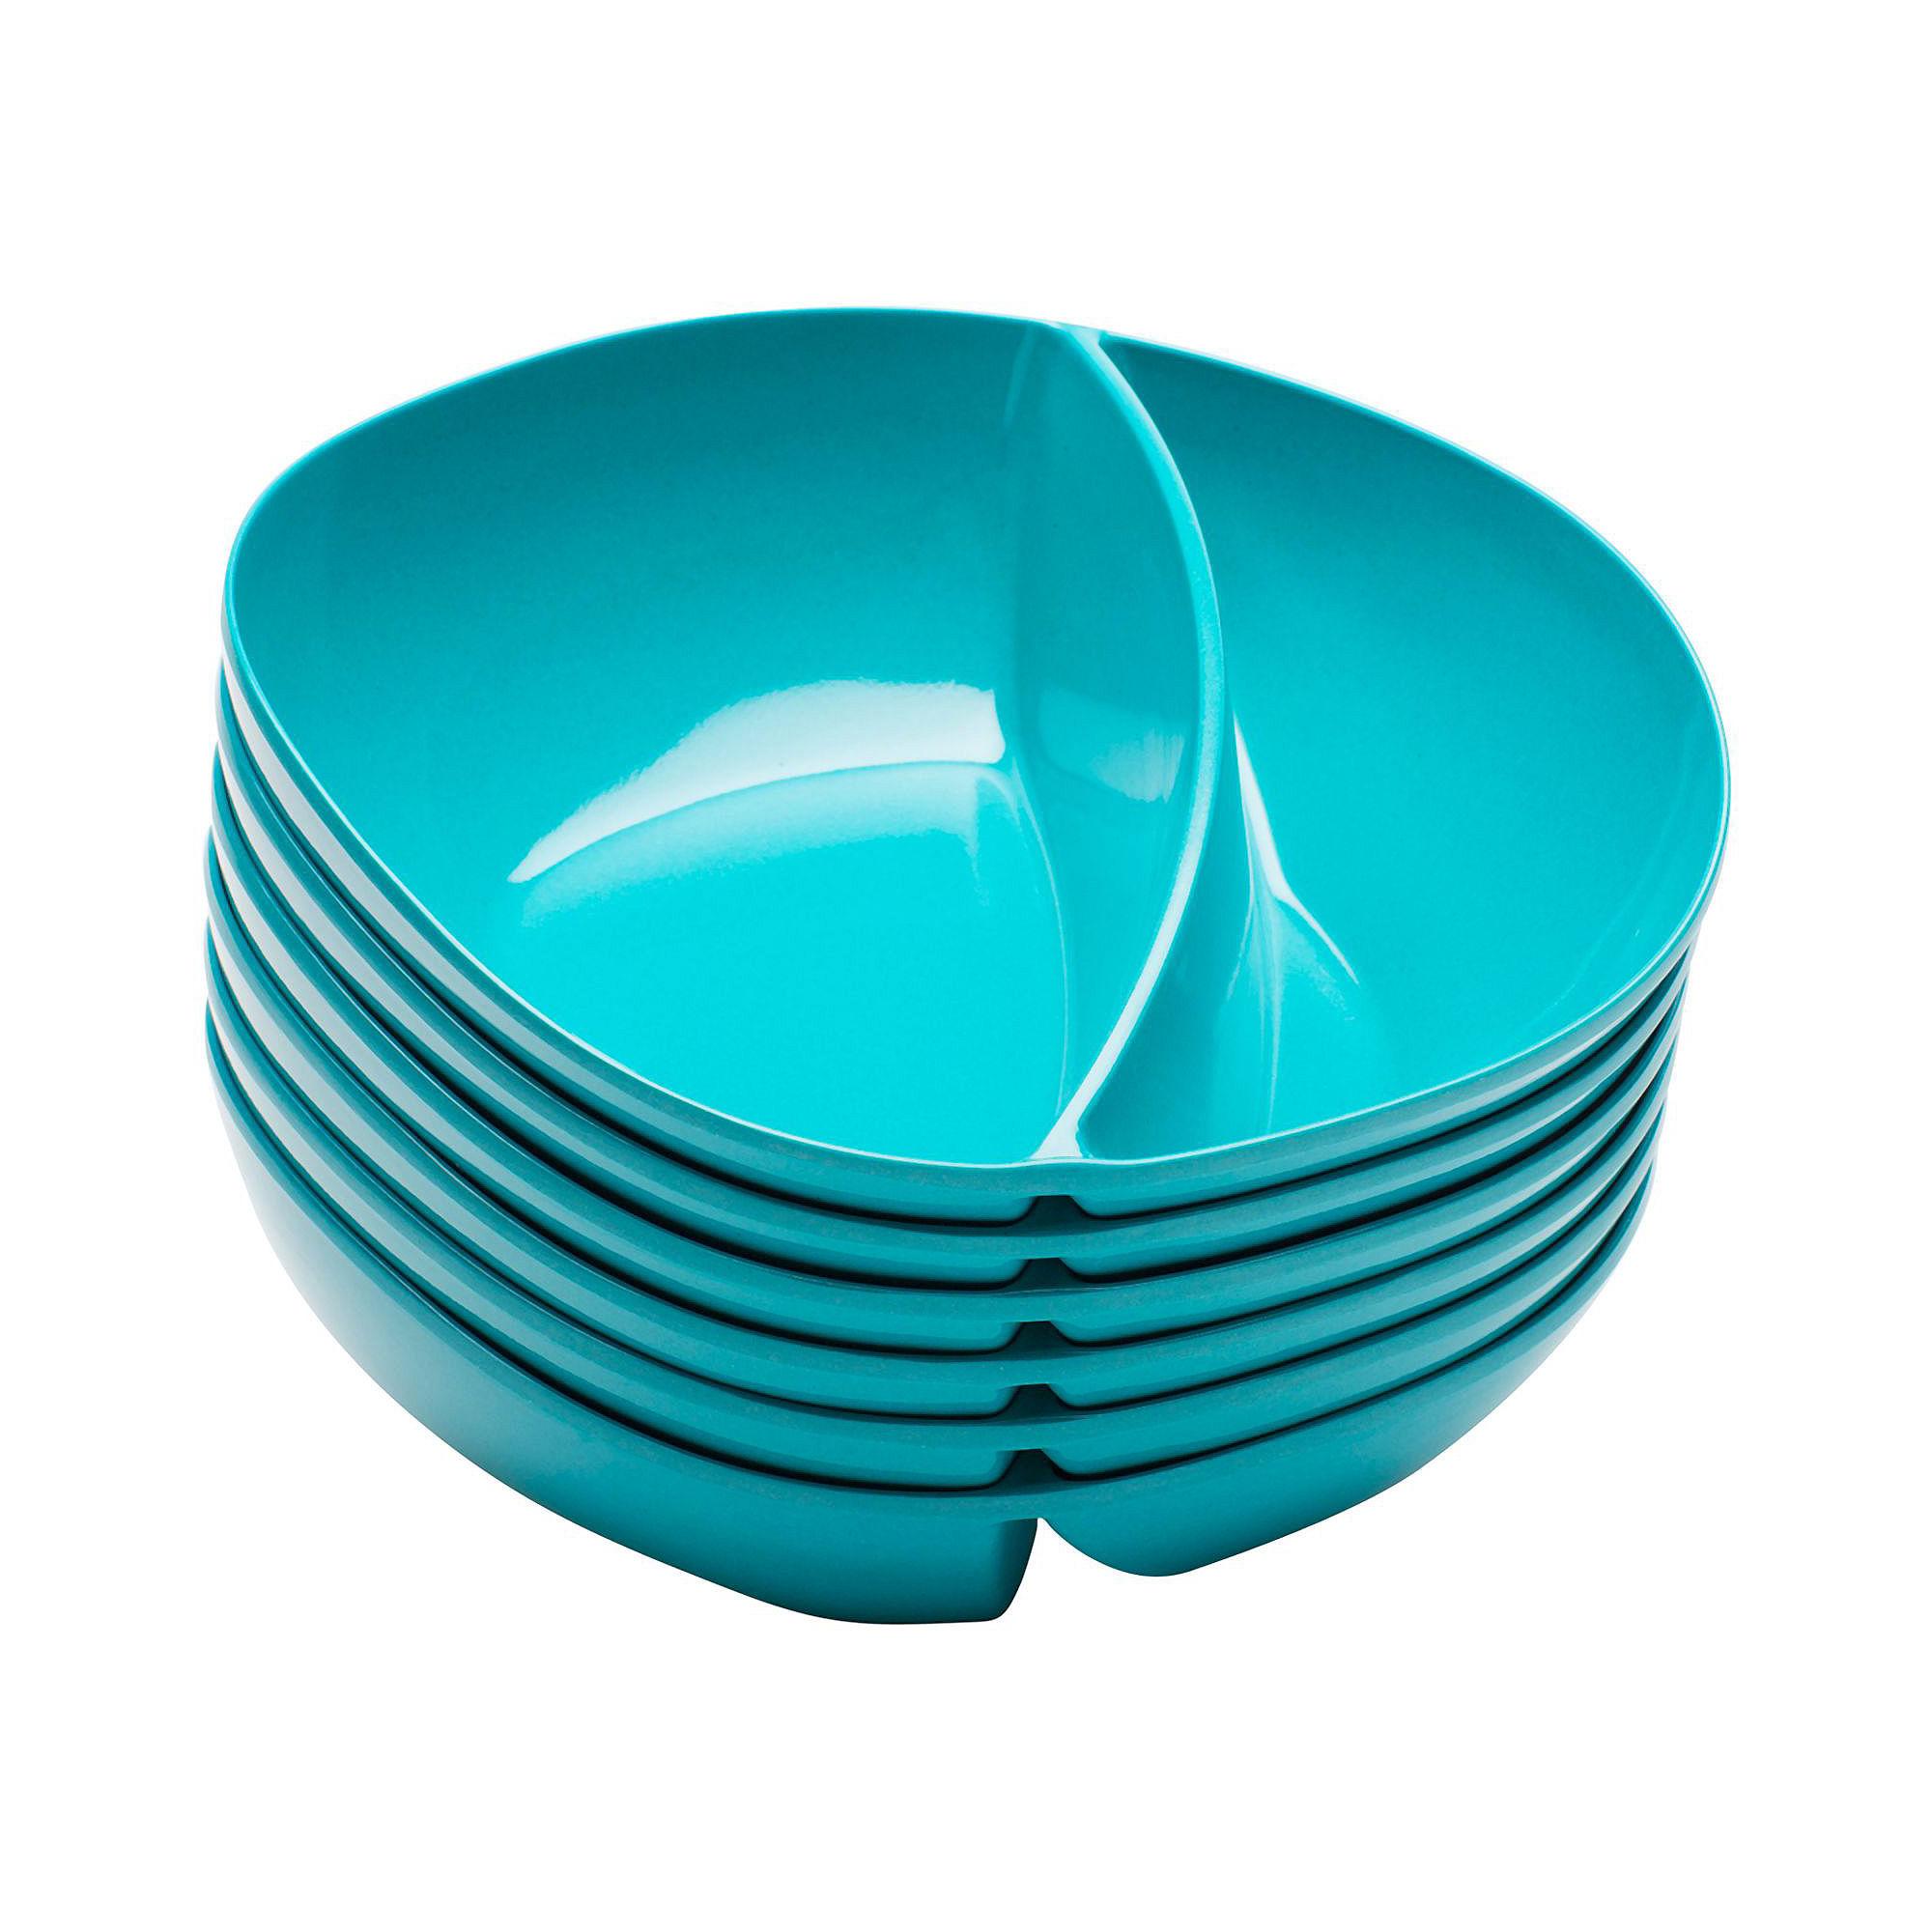 Zak Designs Moso Set of 6 Divided Bowls